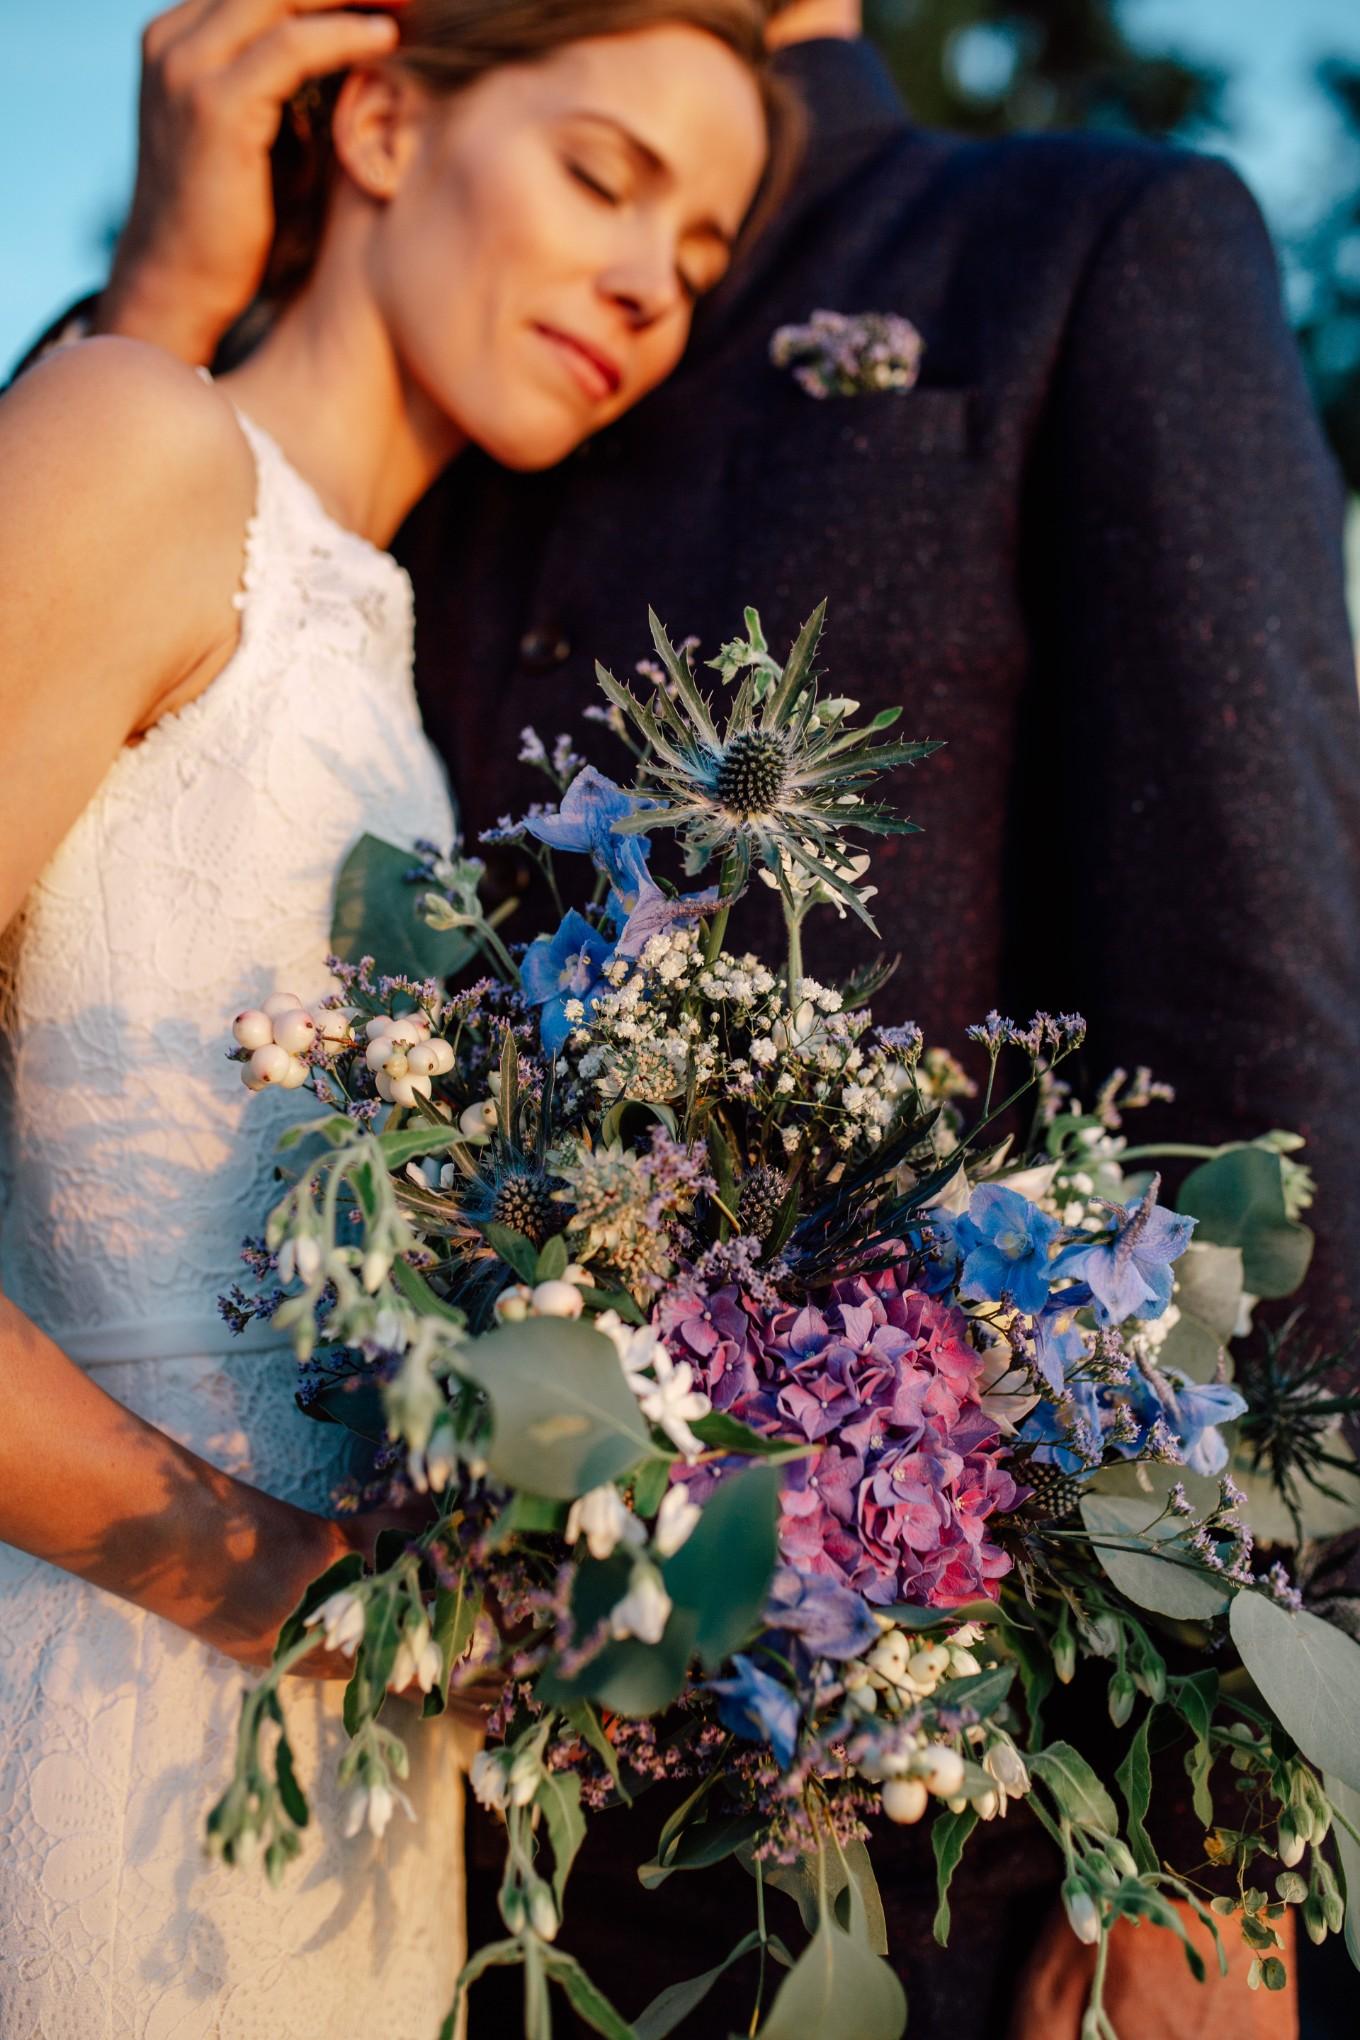 Berlin-Wannsee-Pia-Anna-Christian-Wedding-Photography-ST-83.jpg